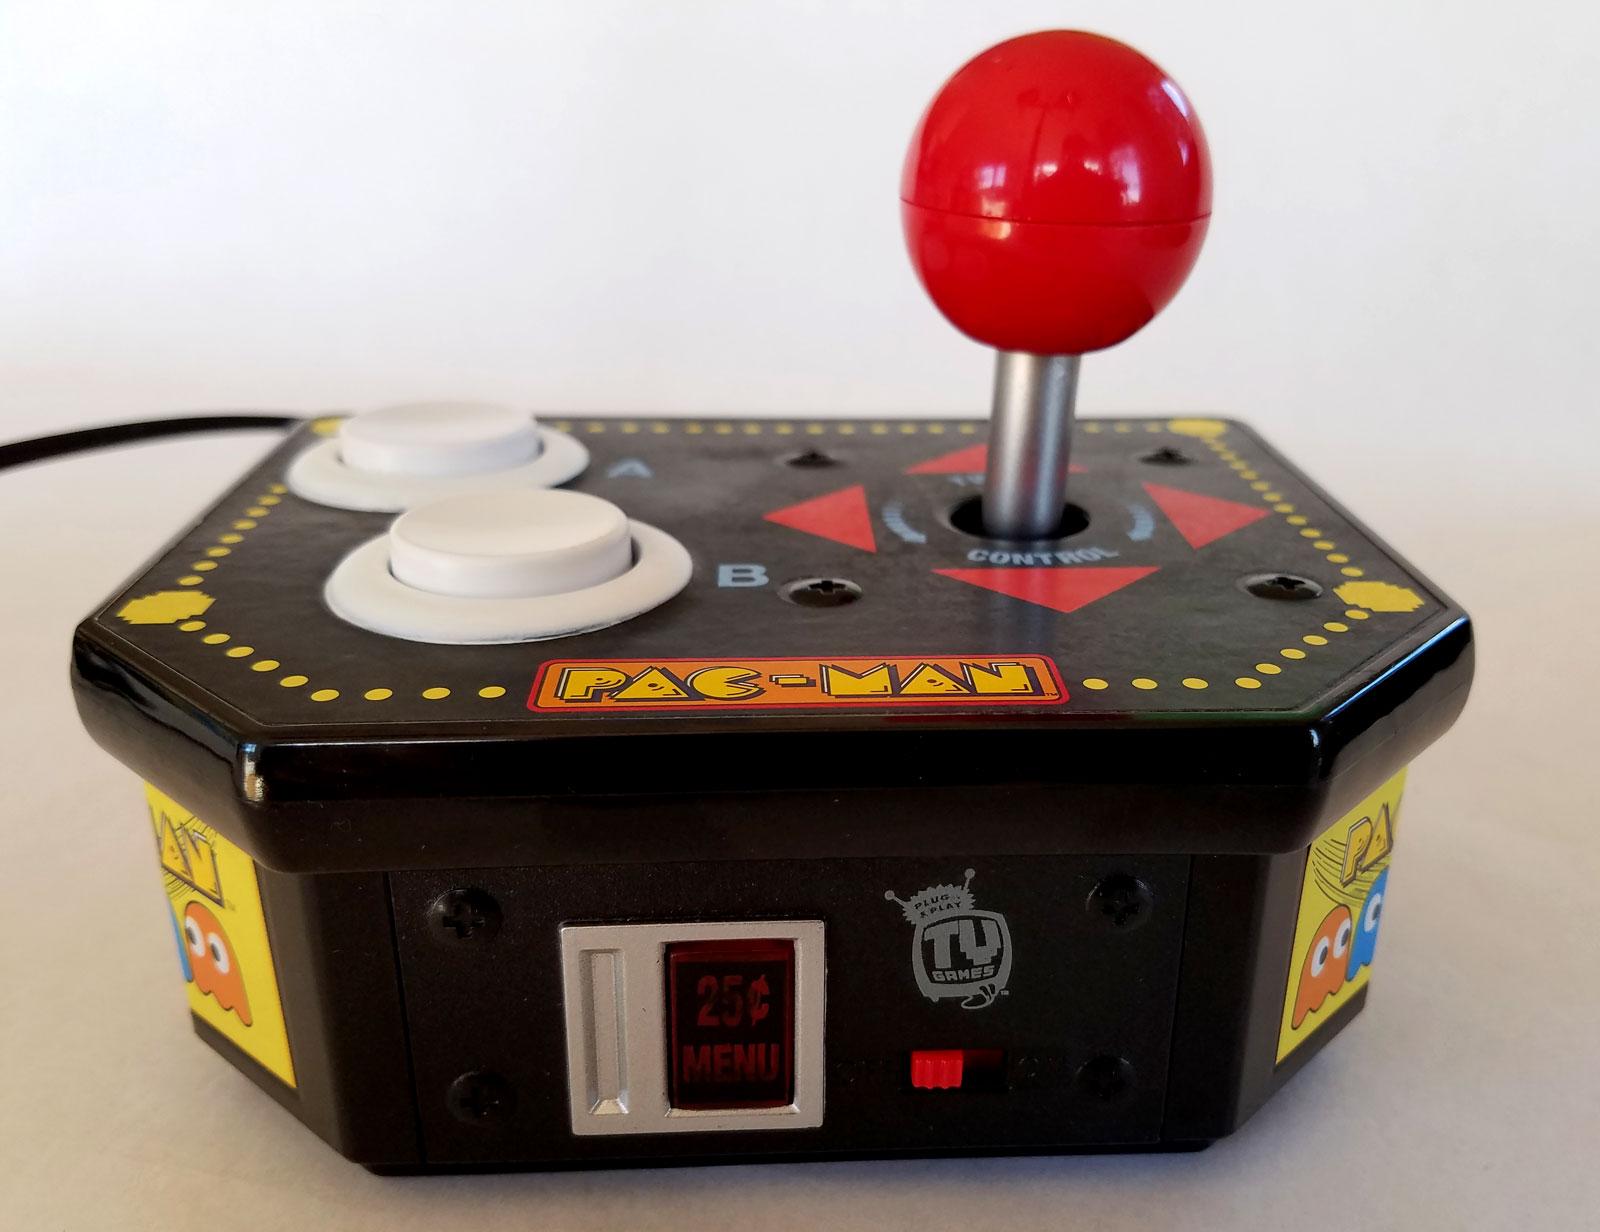 Arcade game joystick photo